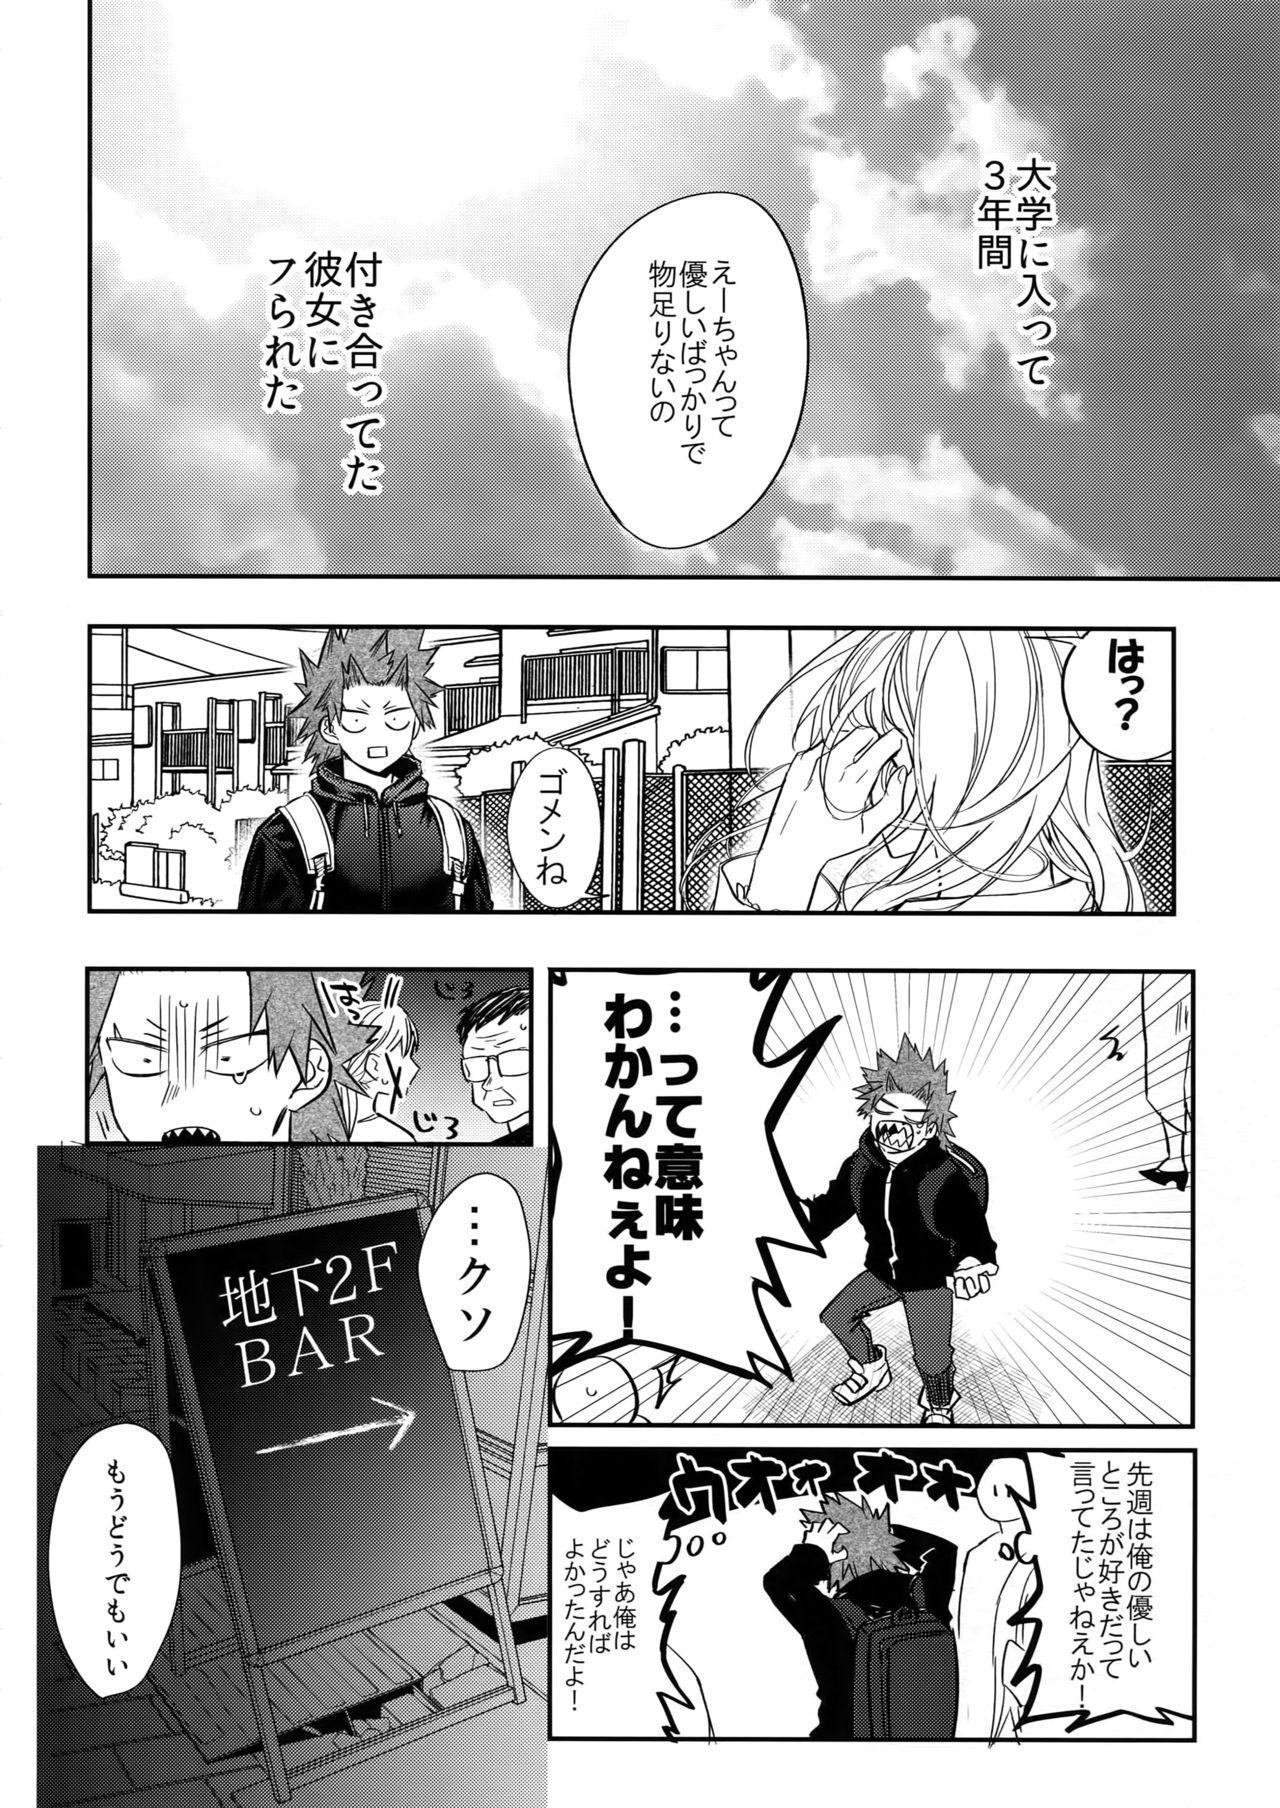 Nonke kui no Bakugo-san 2